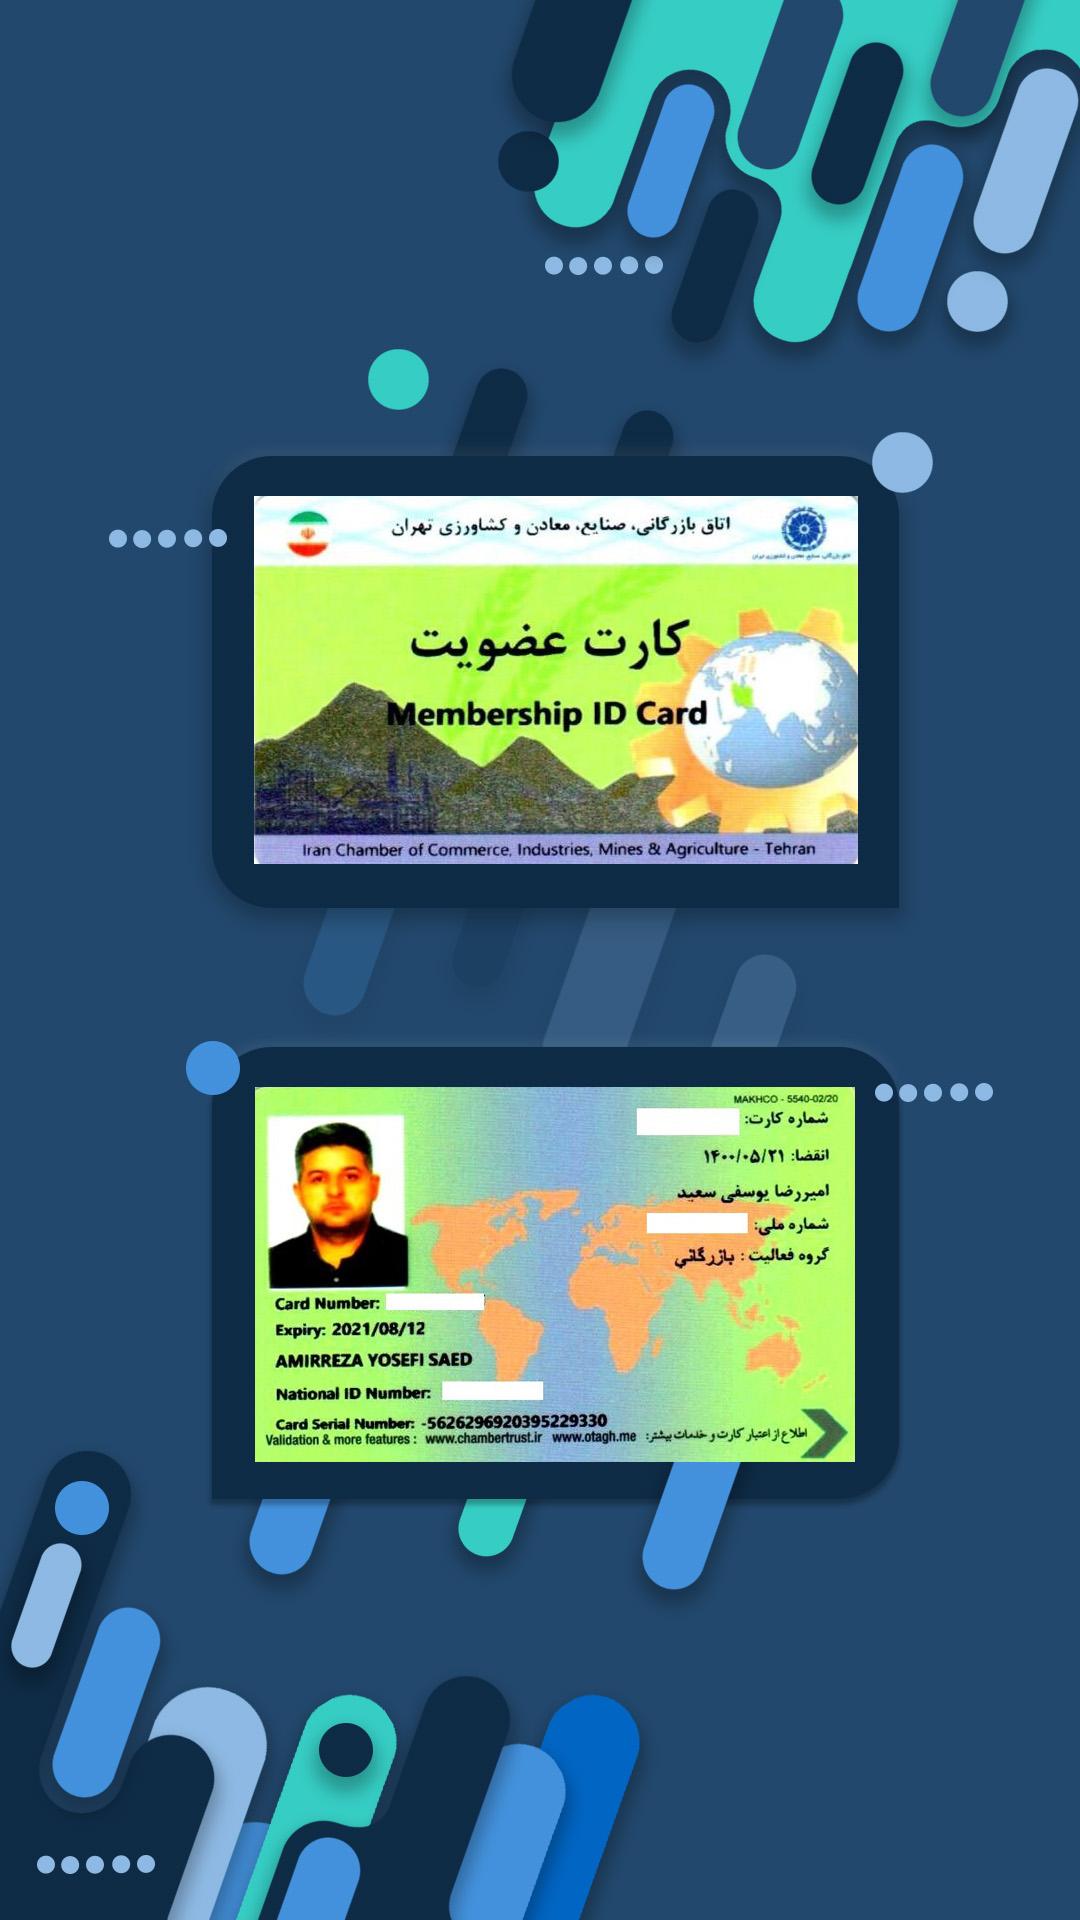 mahan-card-joind-.2-3999